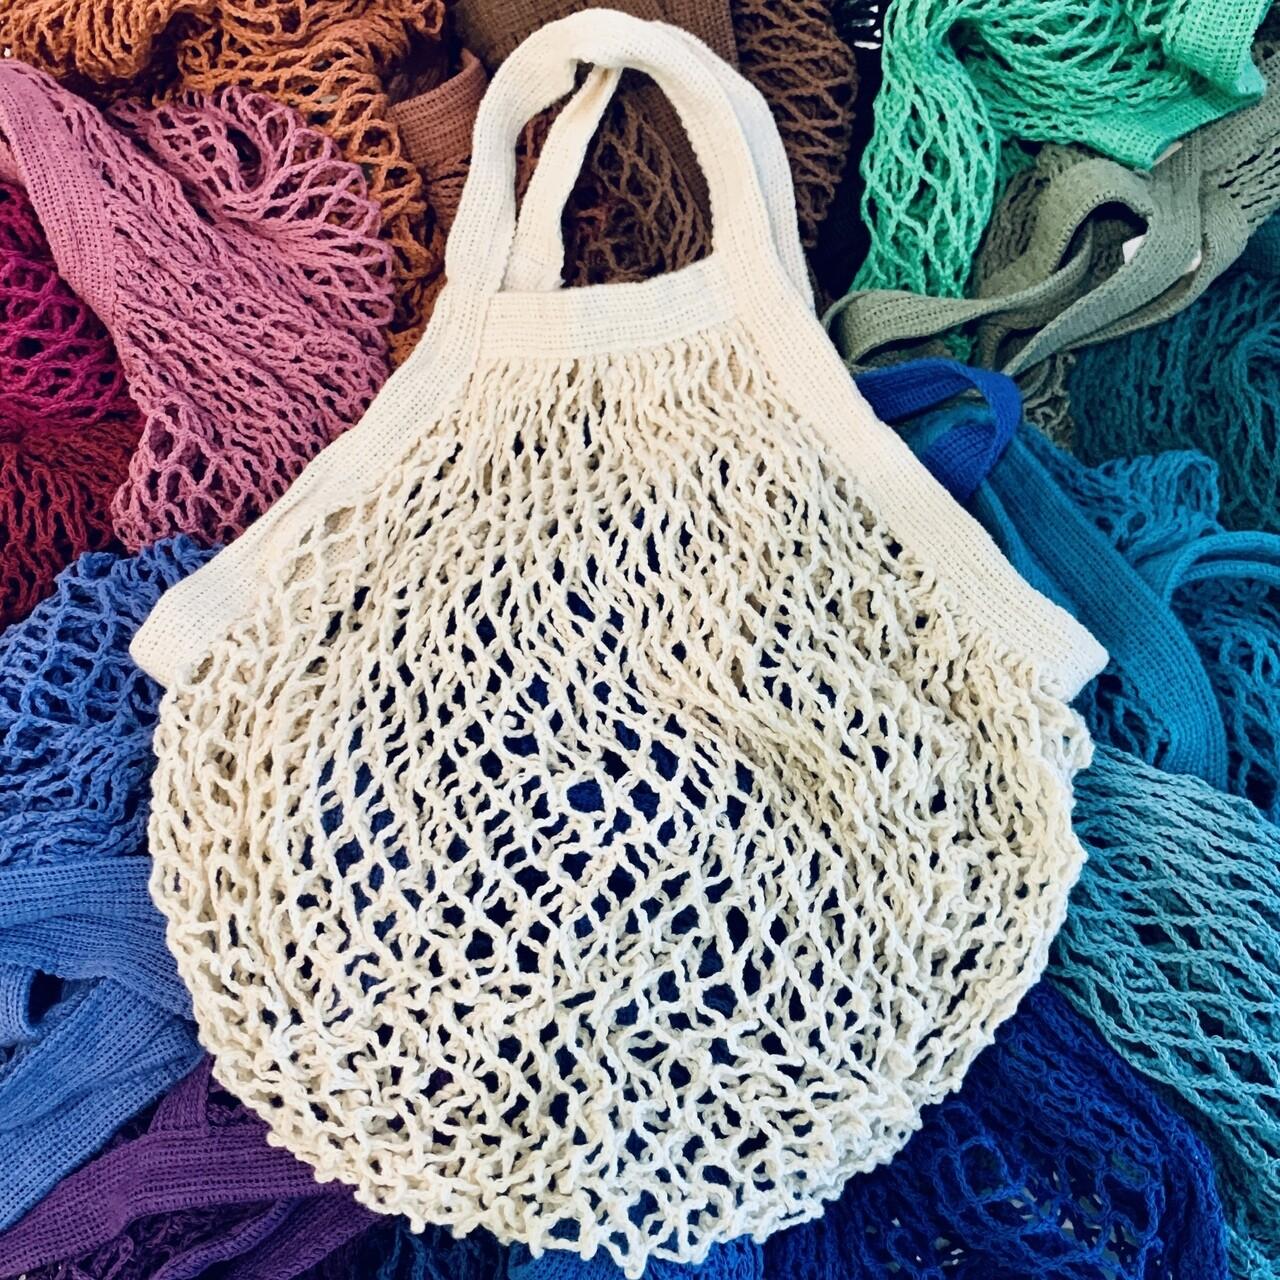 String Grocery Bag - EuroSac